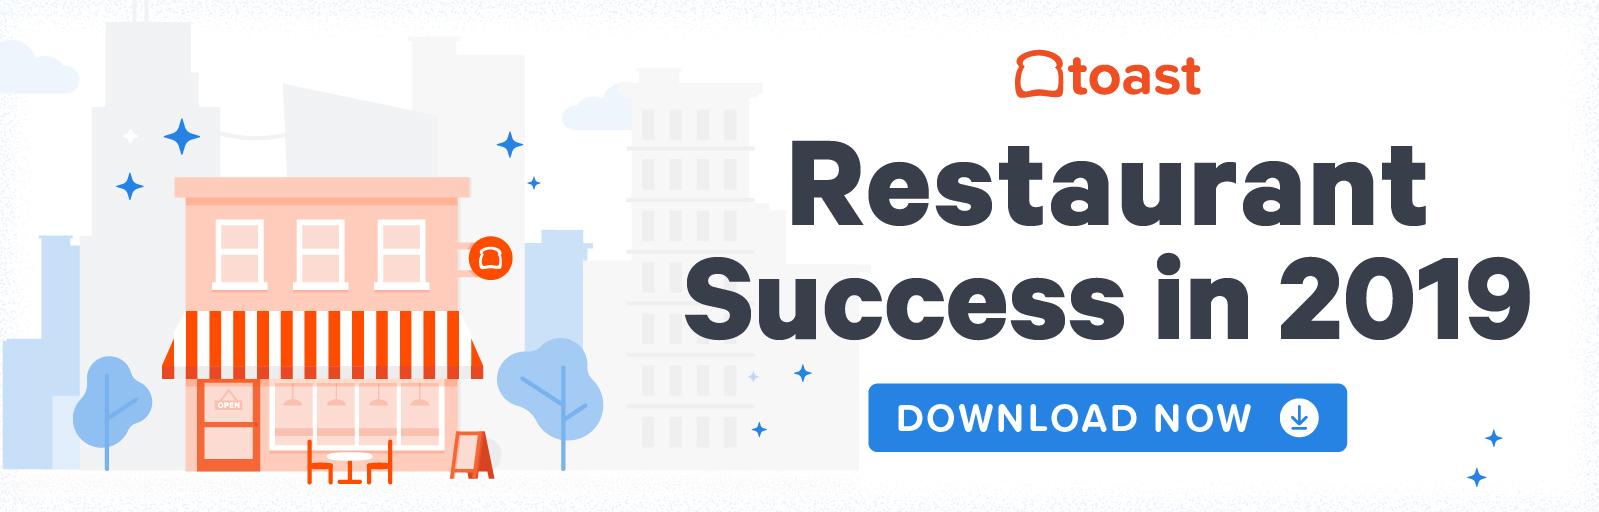 60 Restaurant Industry Statistics for Restaurant Owners in